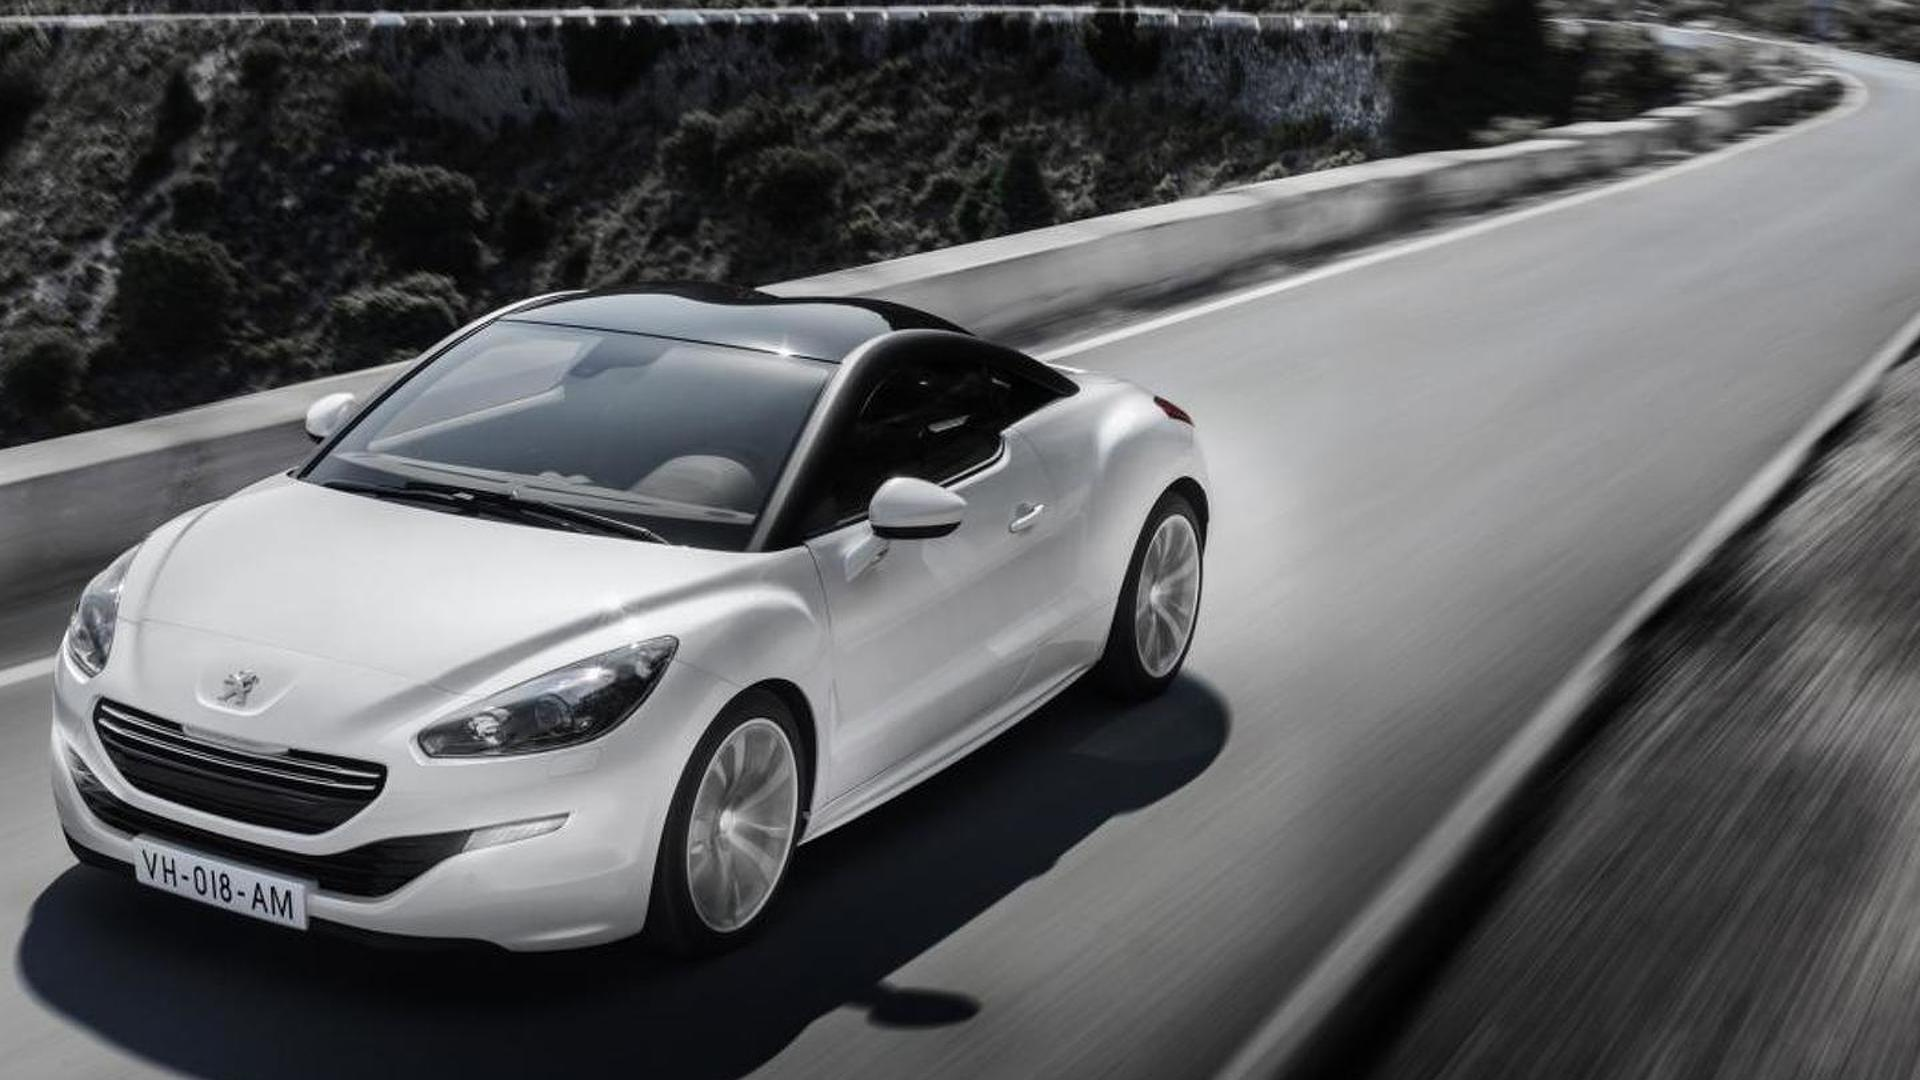 2013 Peugeot RCZ facelift revealed